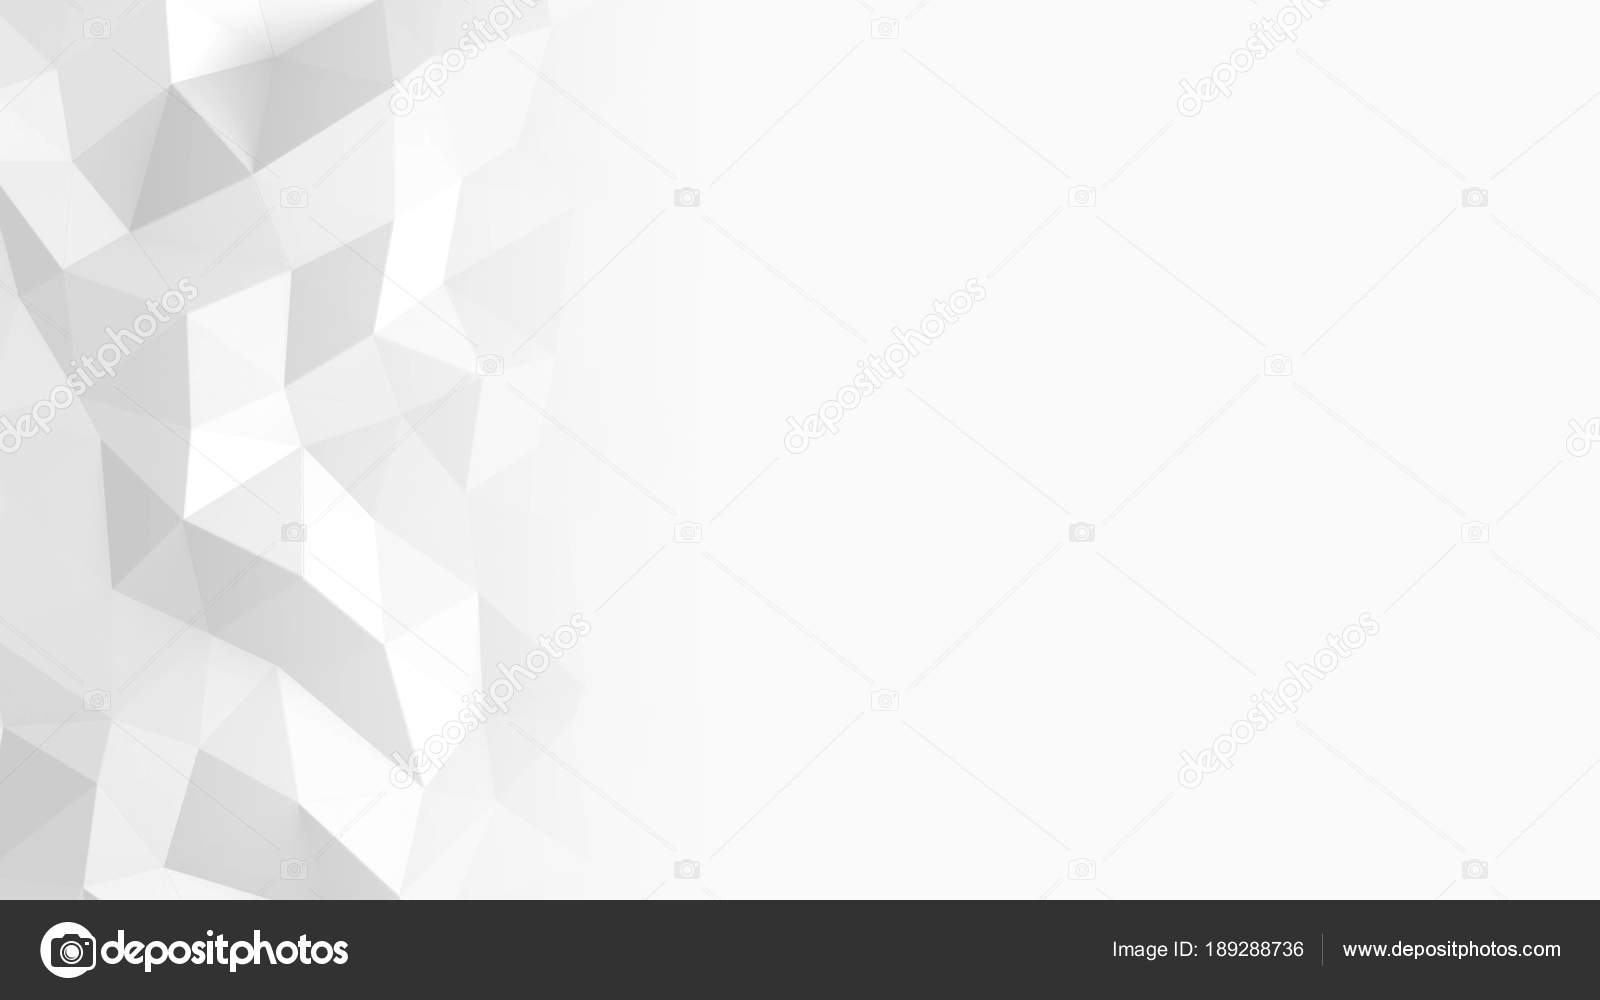 Abstract Polygonal Geometric Background White Color Stock Photo C Irochka 189288736